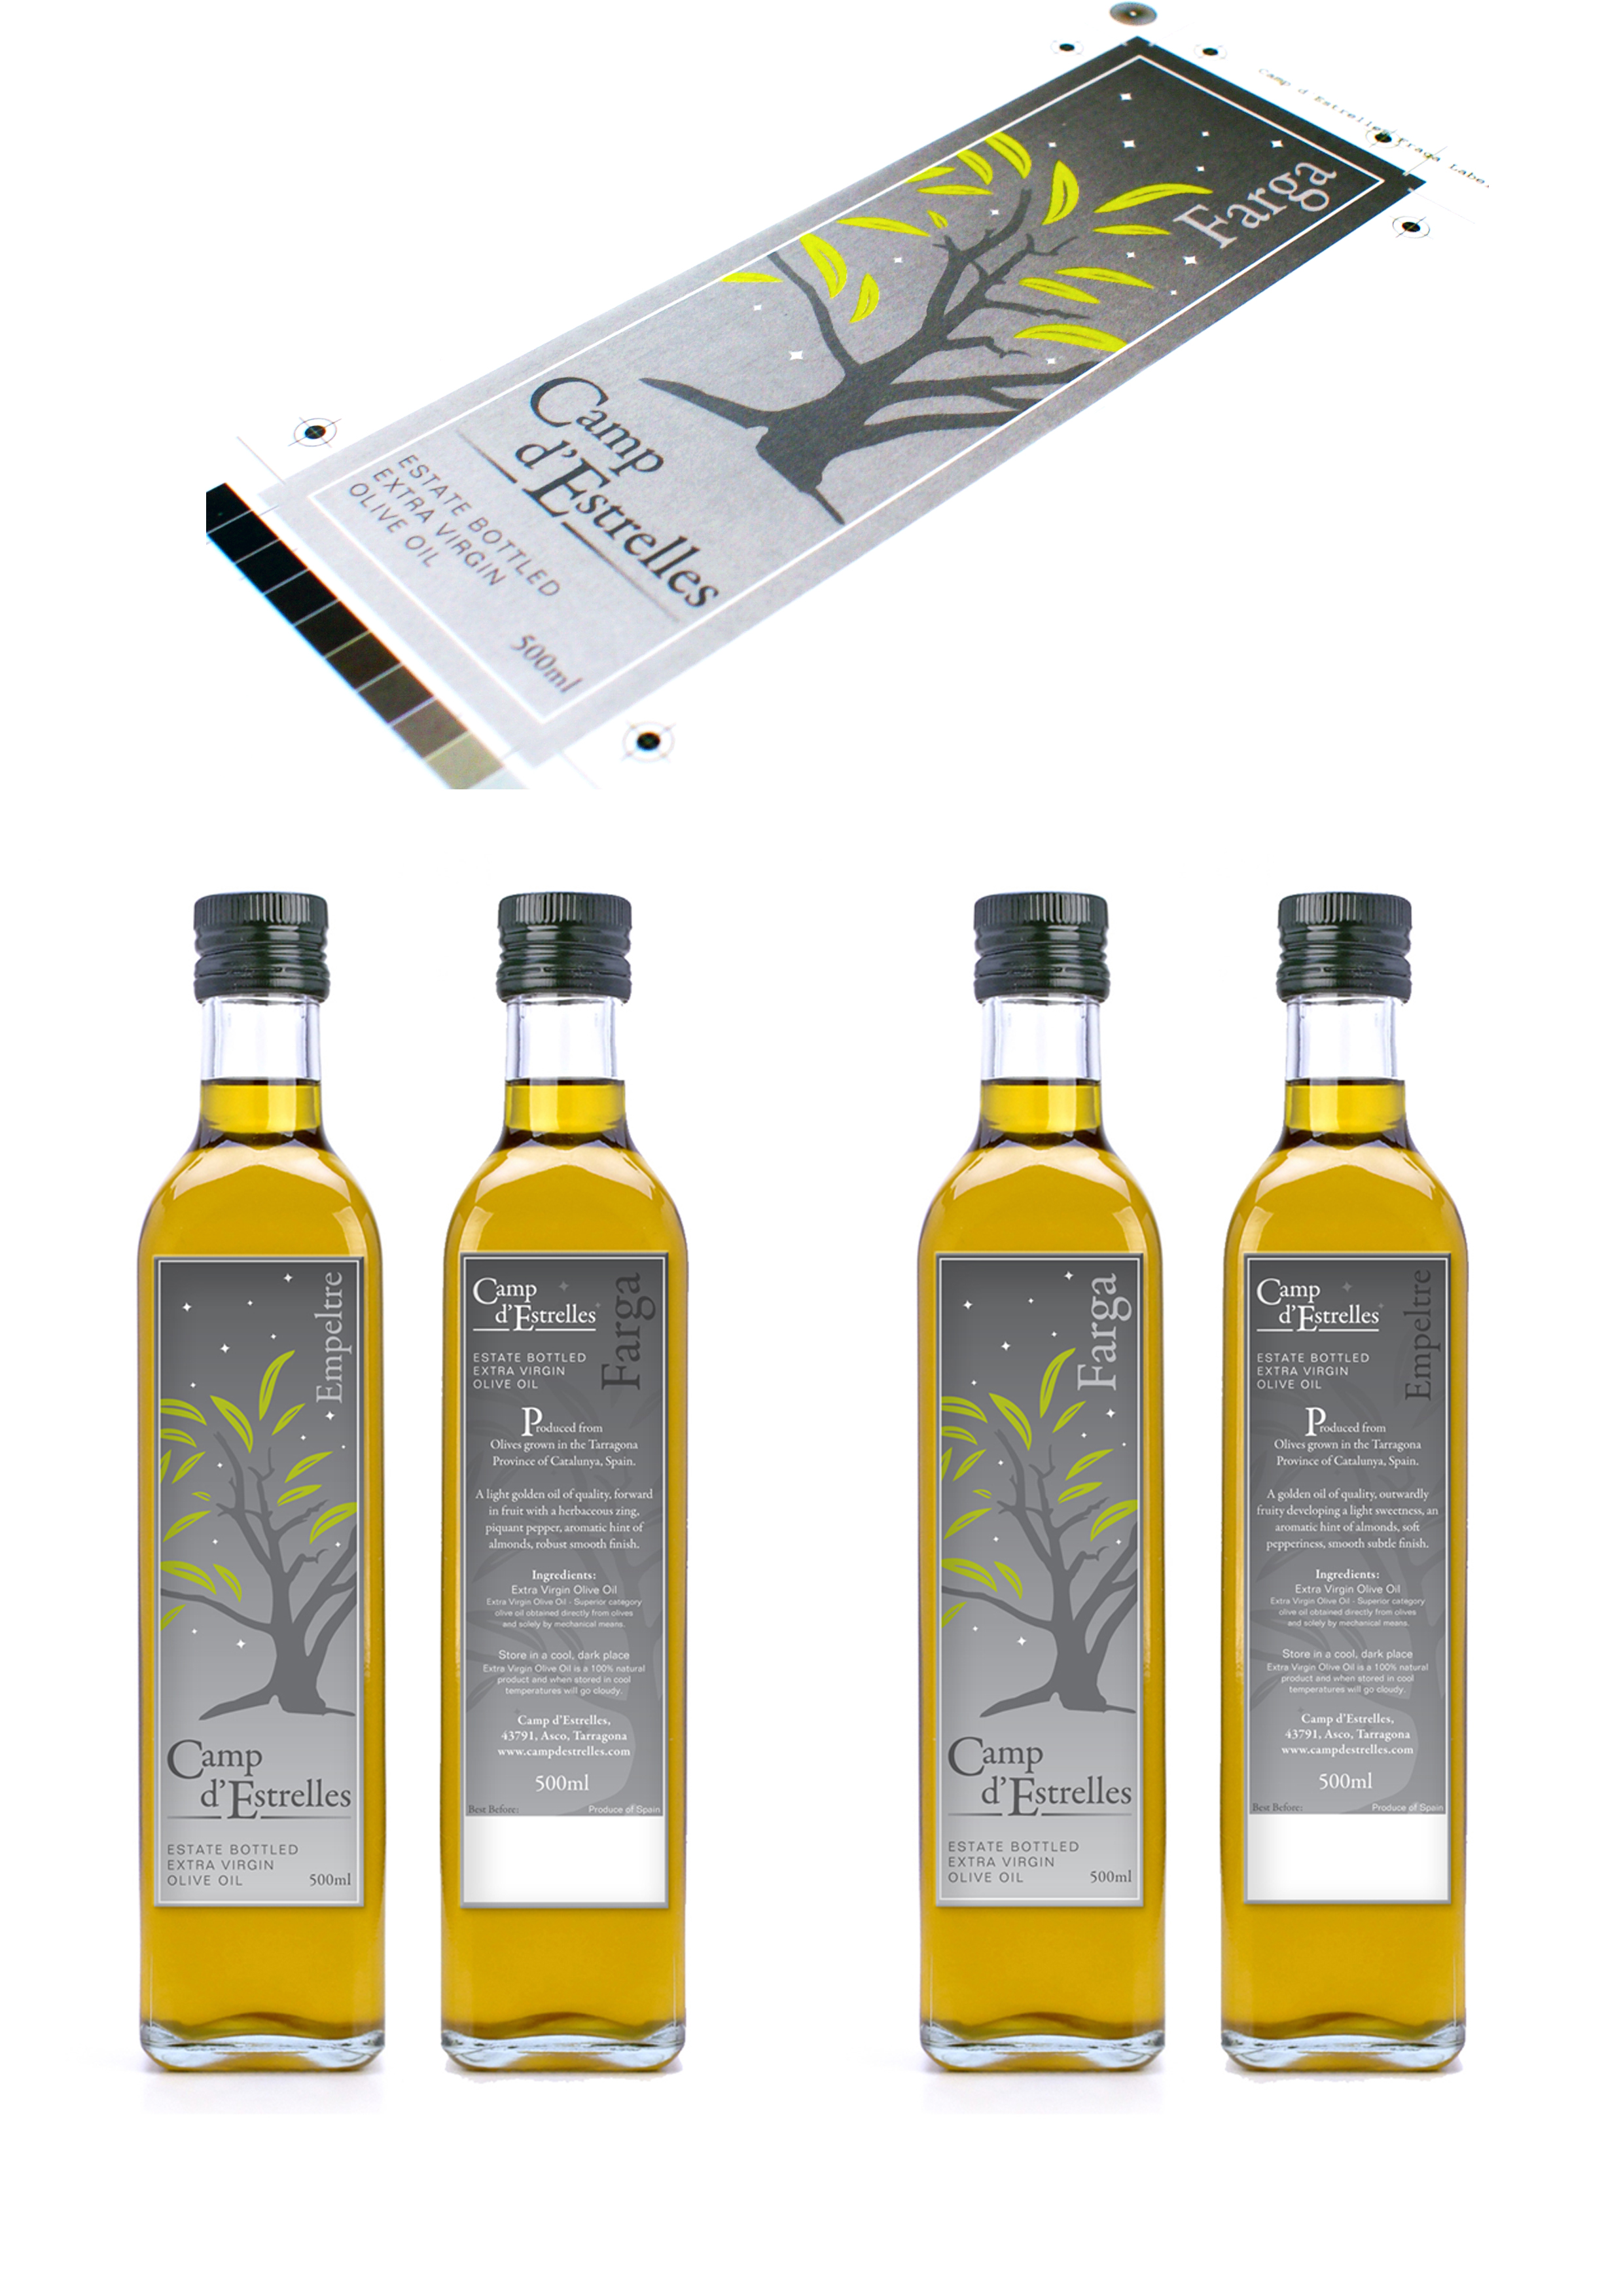 Camp d'Estrelles Olive Oil label